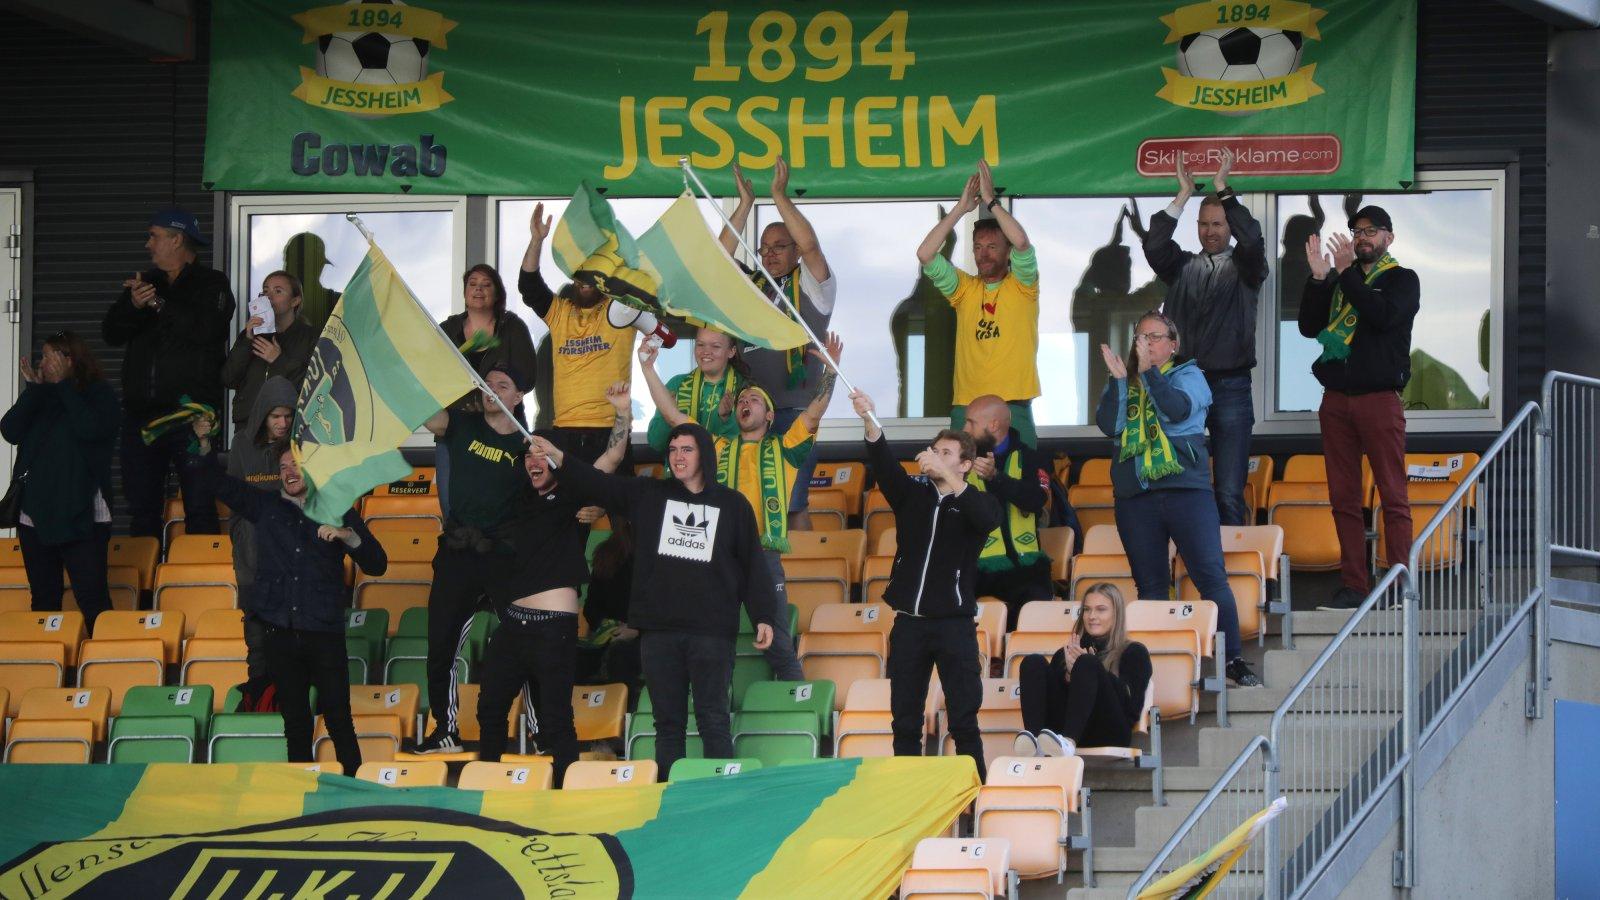 1894 Jessheim skapte bra liv fra sine plasser på Jessheim stadion.